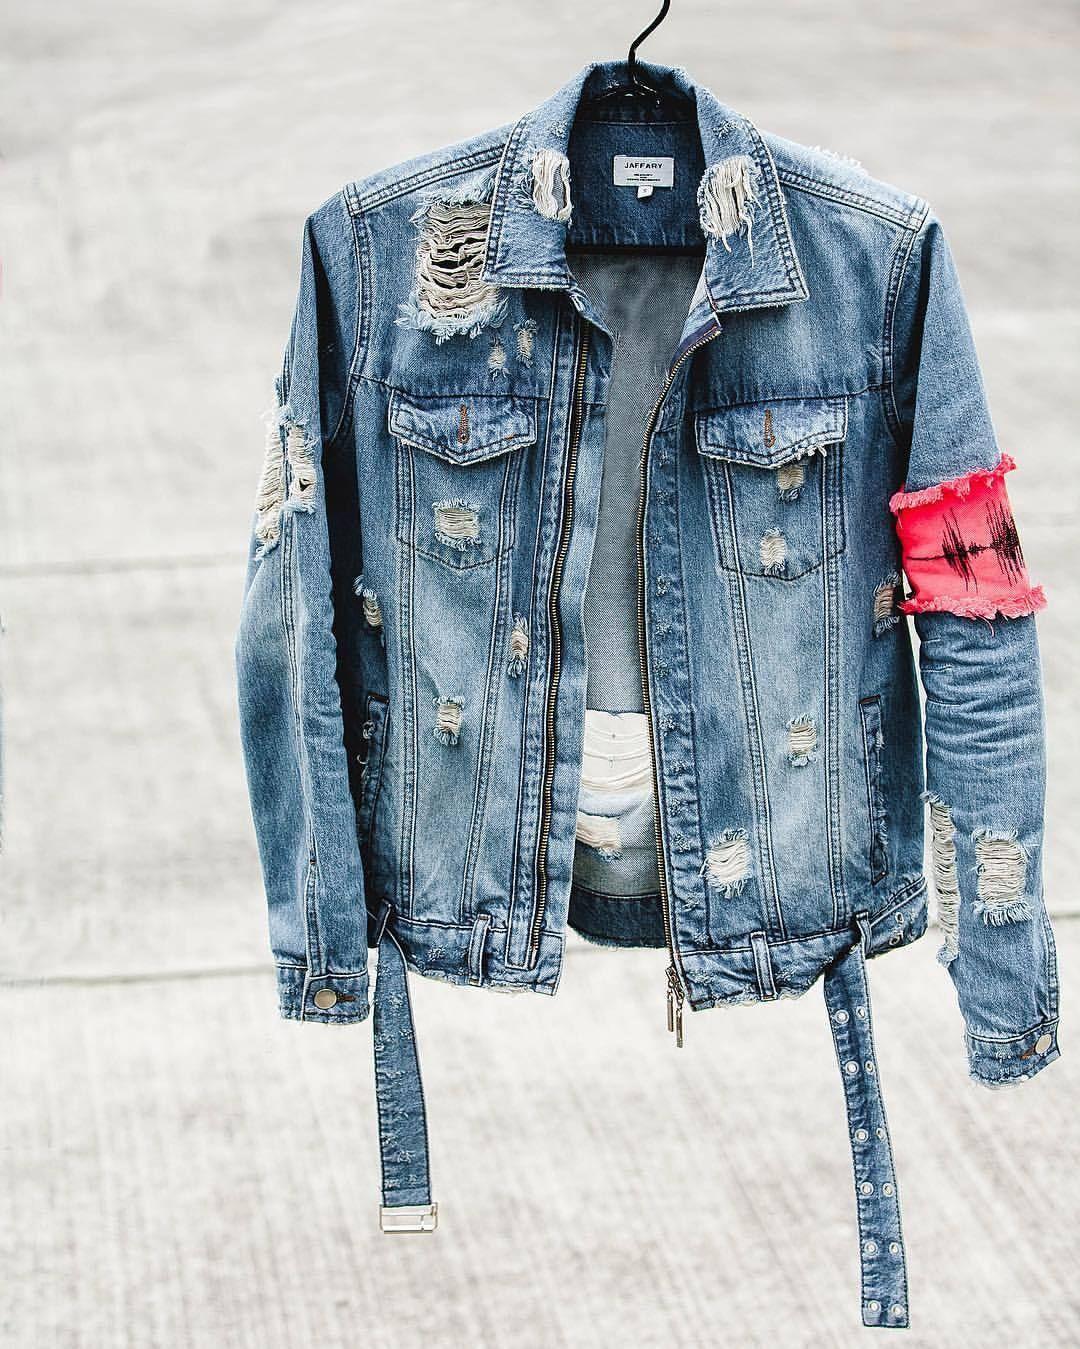 Classic Men Retro Punk Denim Washed Jacket Retro Vintage Coat Street Style Jean